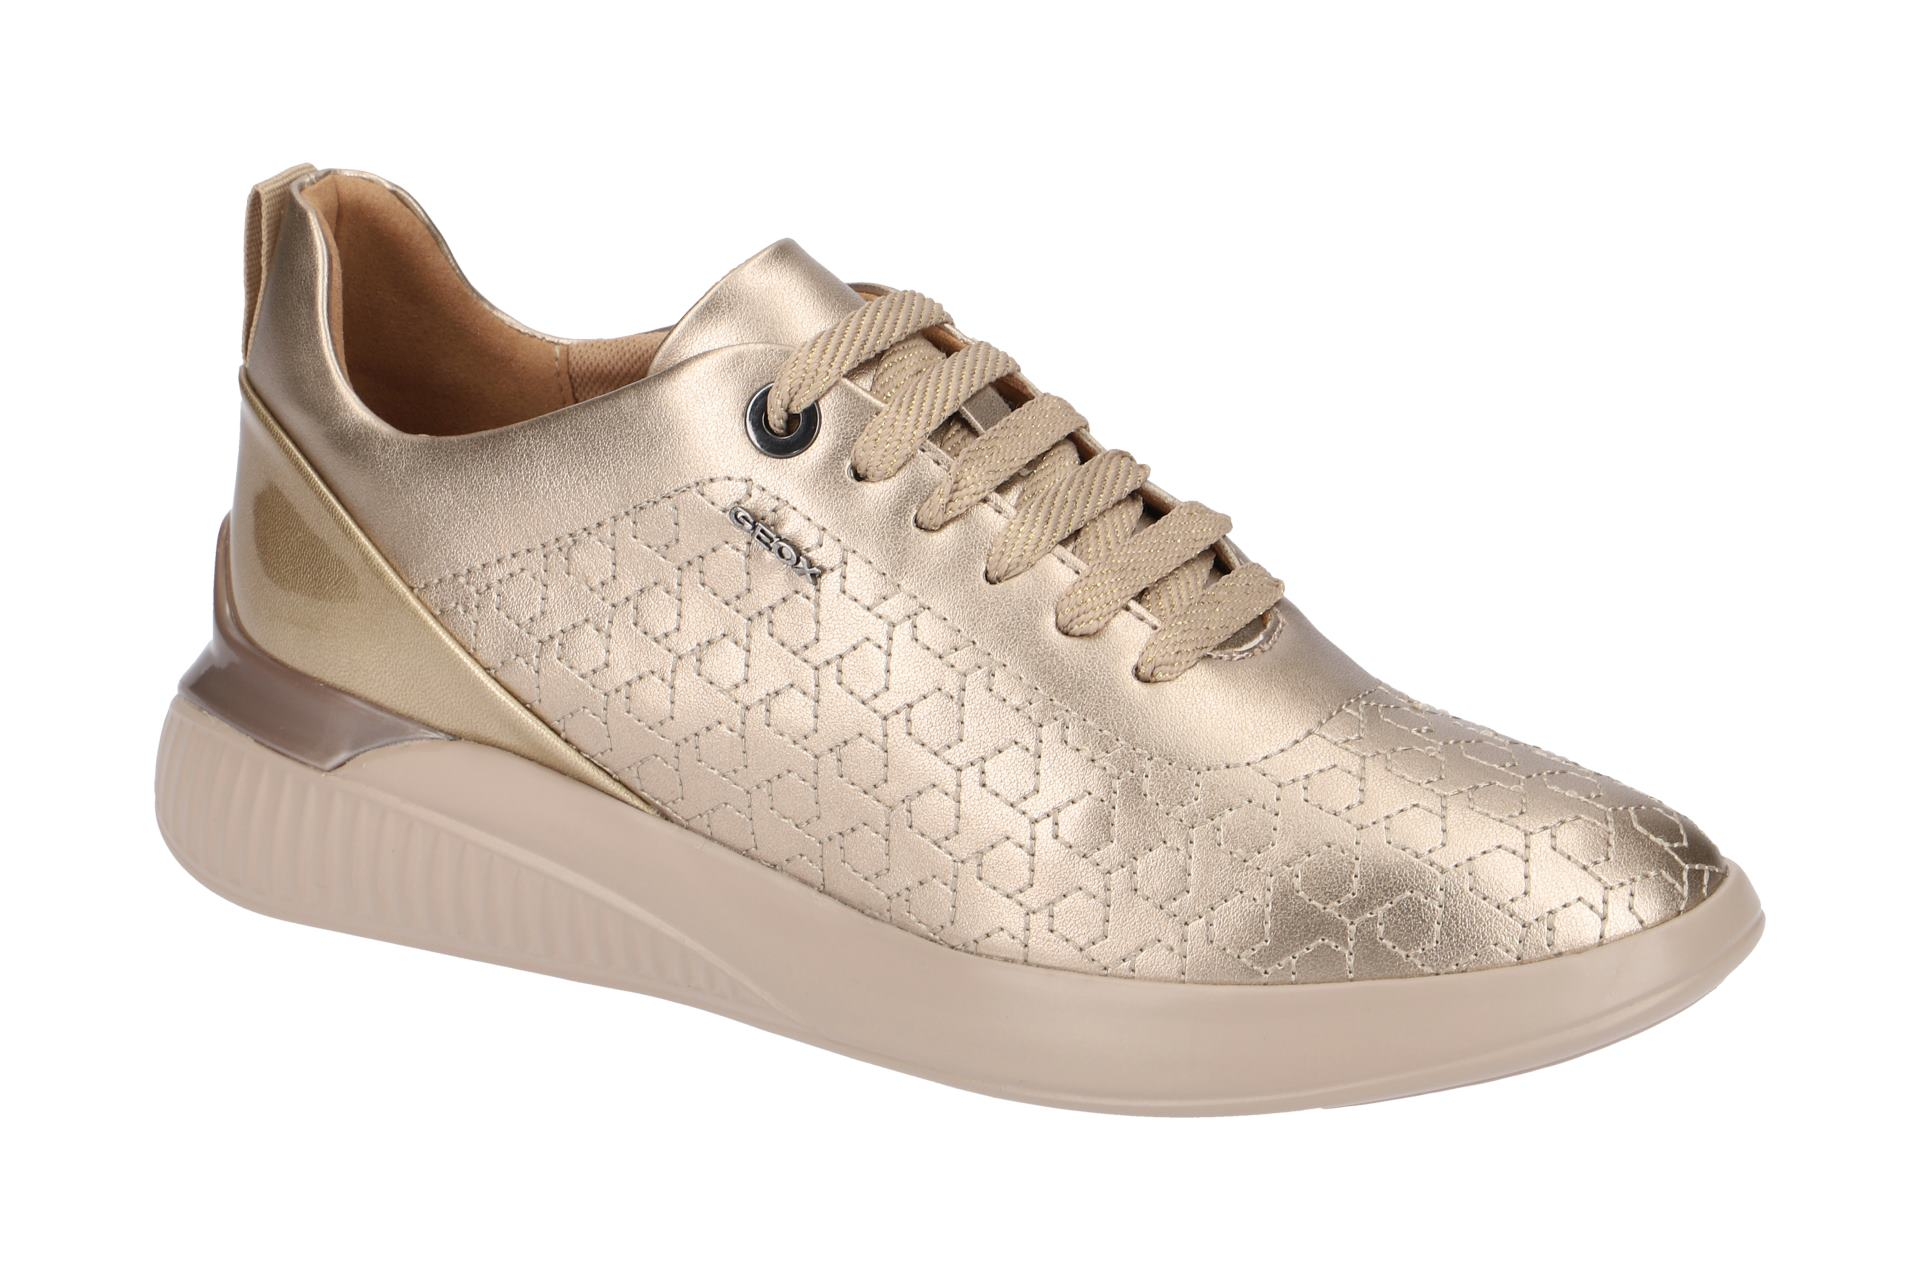 Geox VEGA Damenschuhe Sneaker blau NEU Halbschuhe